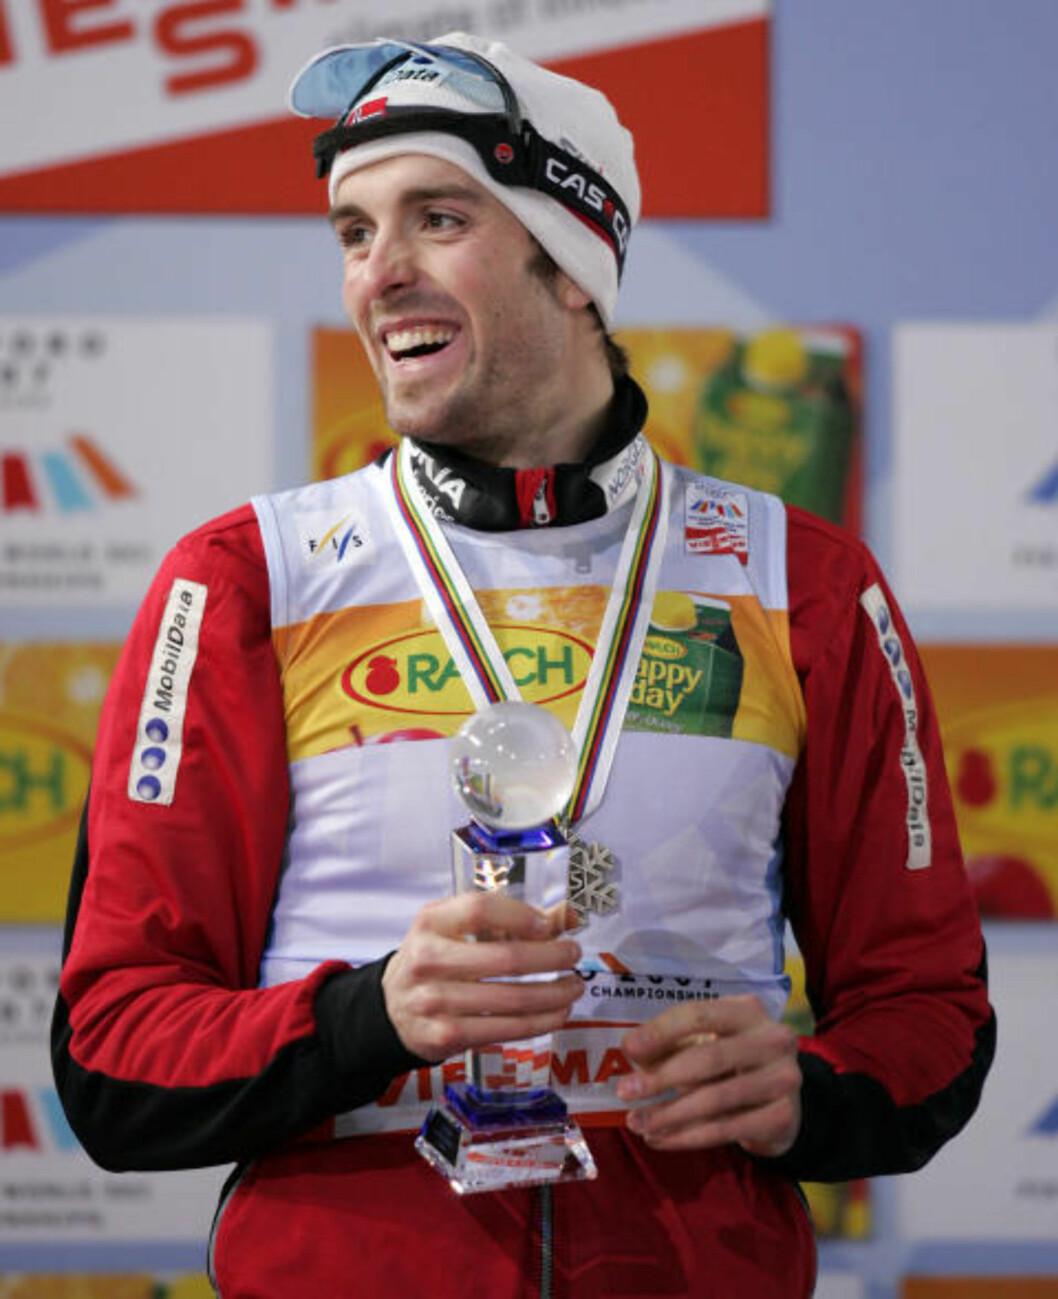 <strong>SAPPORO-SØLV:</strong> Magnus Moan  tok sølv i kombinert sprint under VM på ski i Sapporo Dome i 2007.Foto: Erlend Aas / SCANPIX